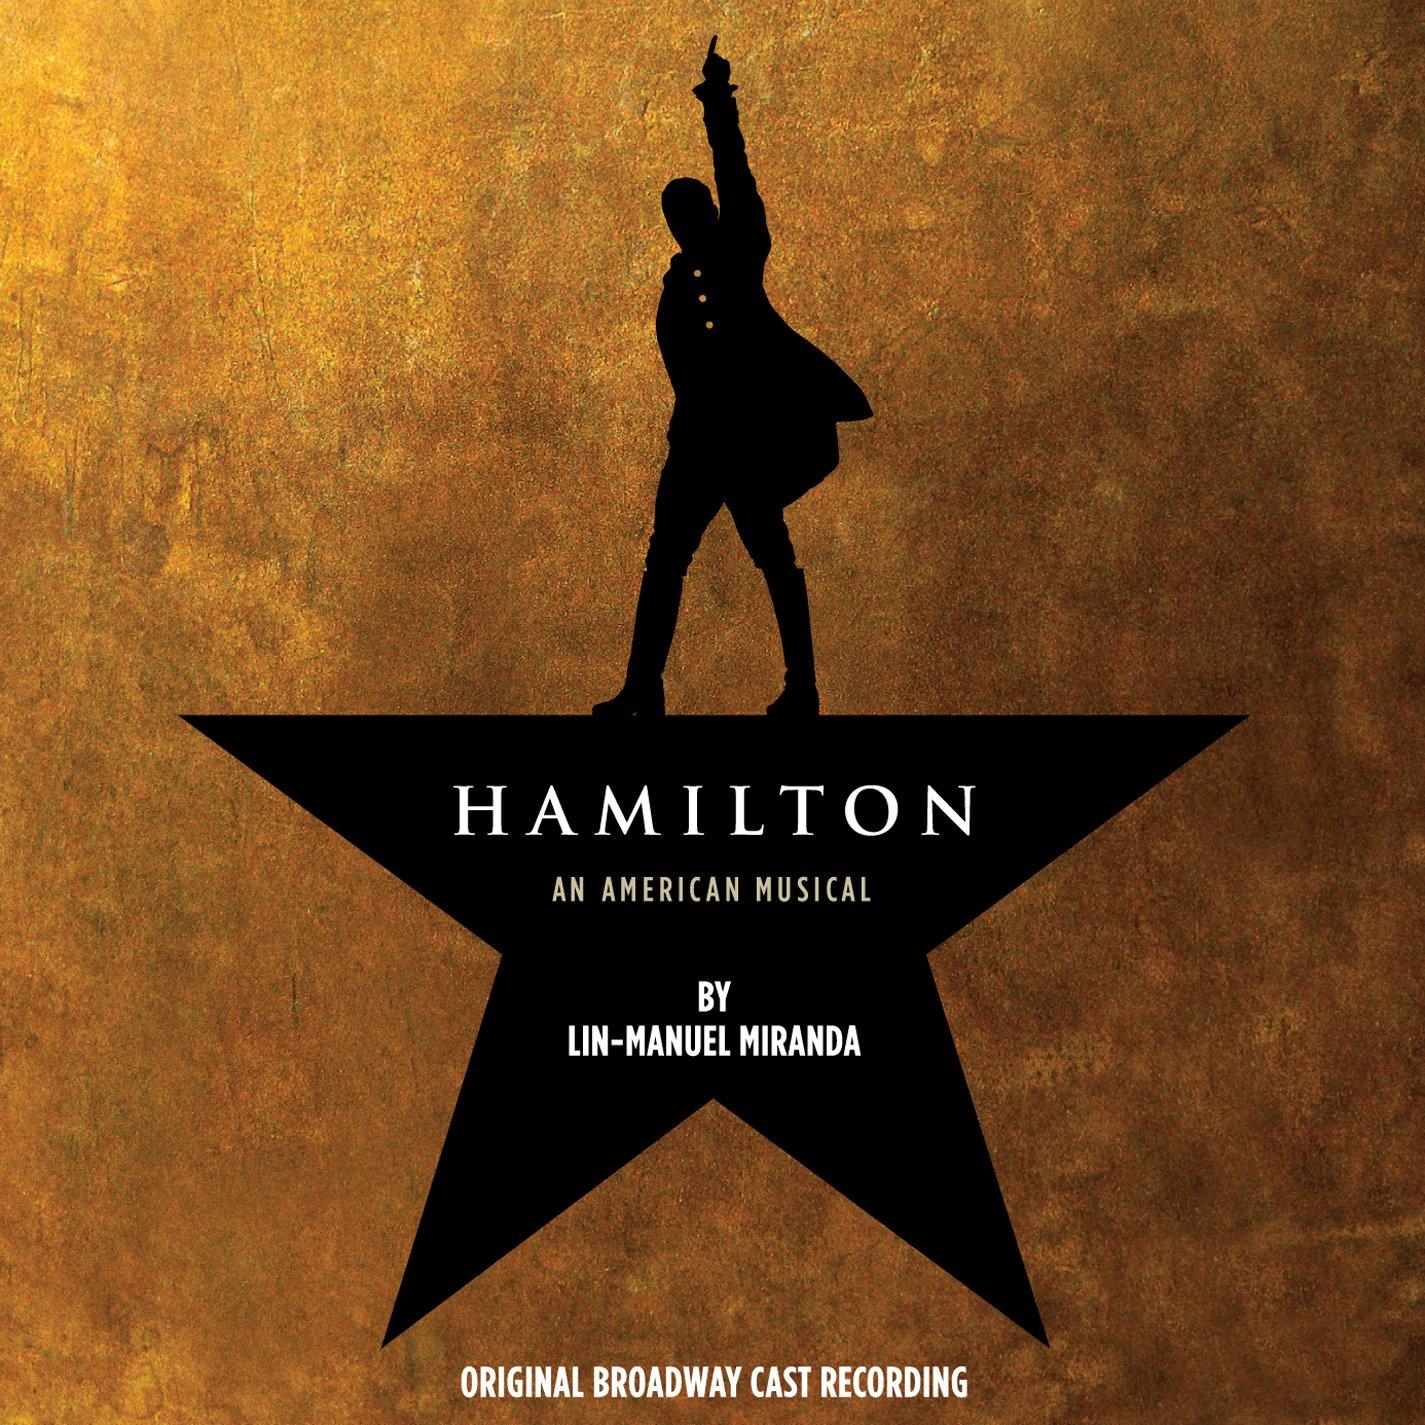 Hamilton (Original Broadway Cast Recording)(Edited)(2CD) by Atlantic (Label)